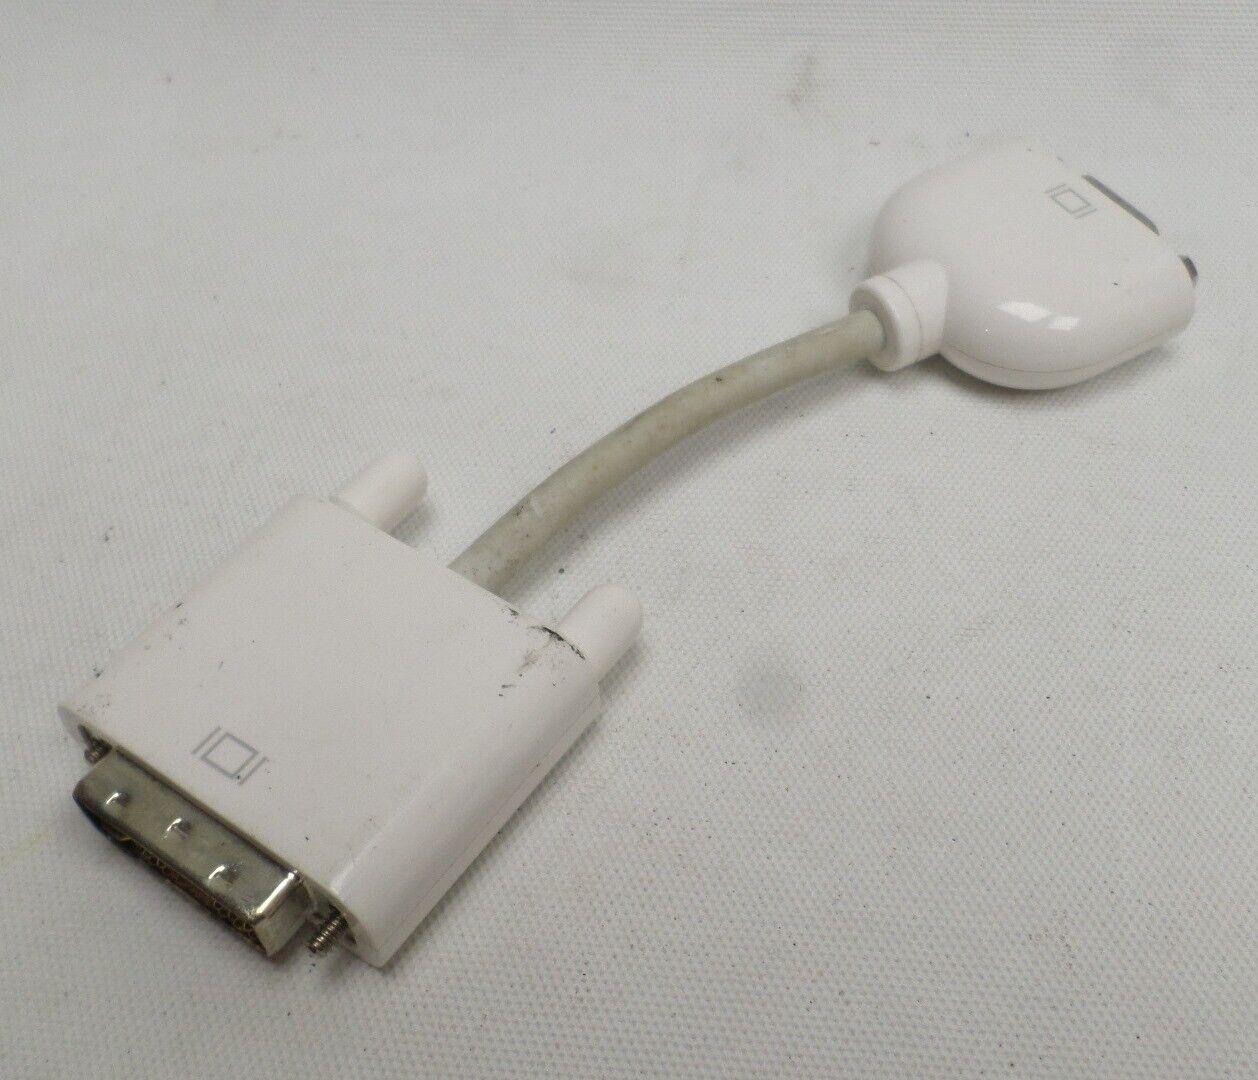 Genuine OEM Apple DVI to VGA Adapter Cable Mac Display Monitor free UK P+P